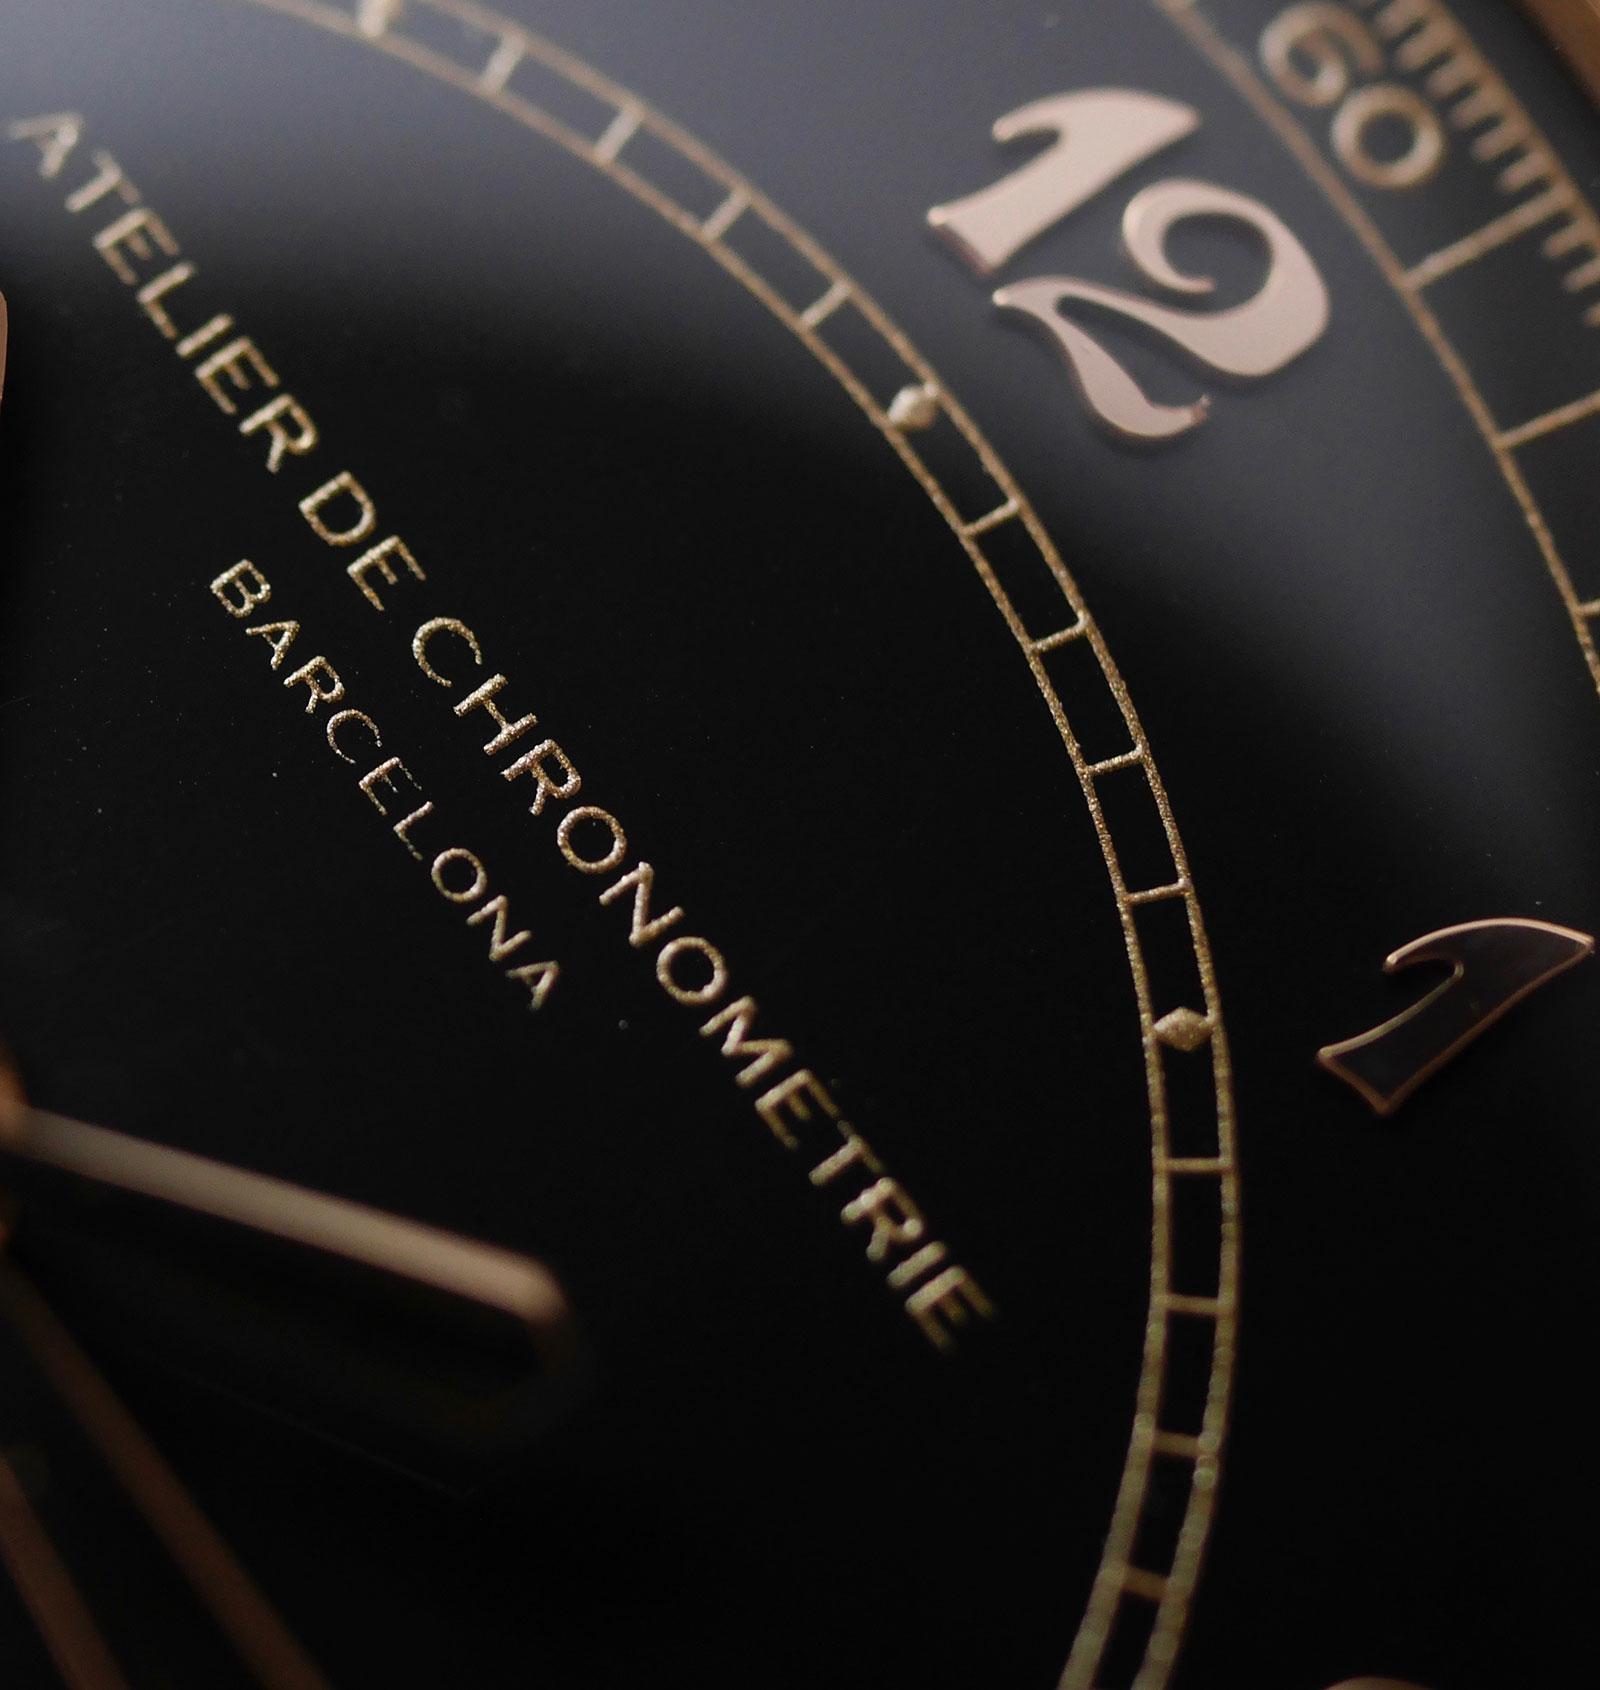 Atelier de Chronometrie AdC #2-3